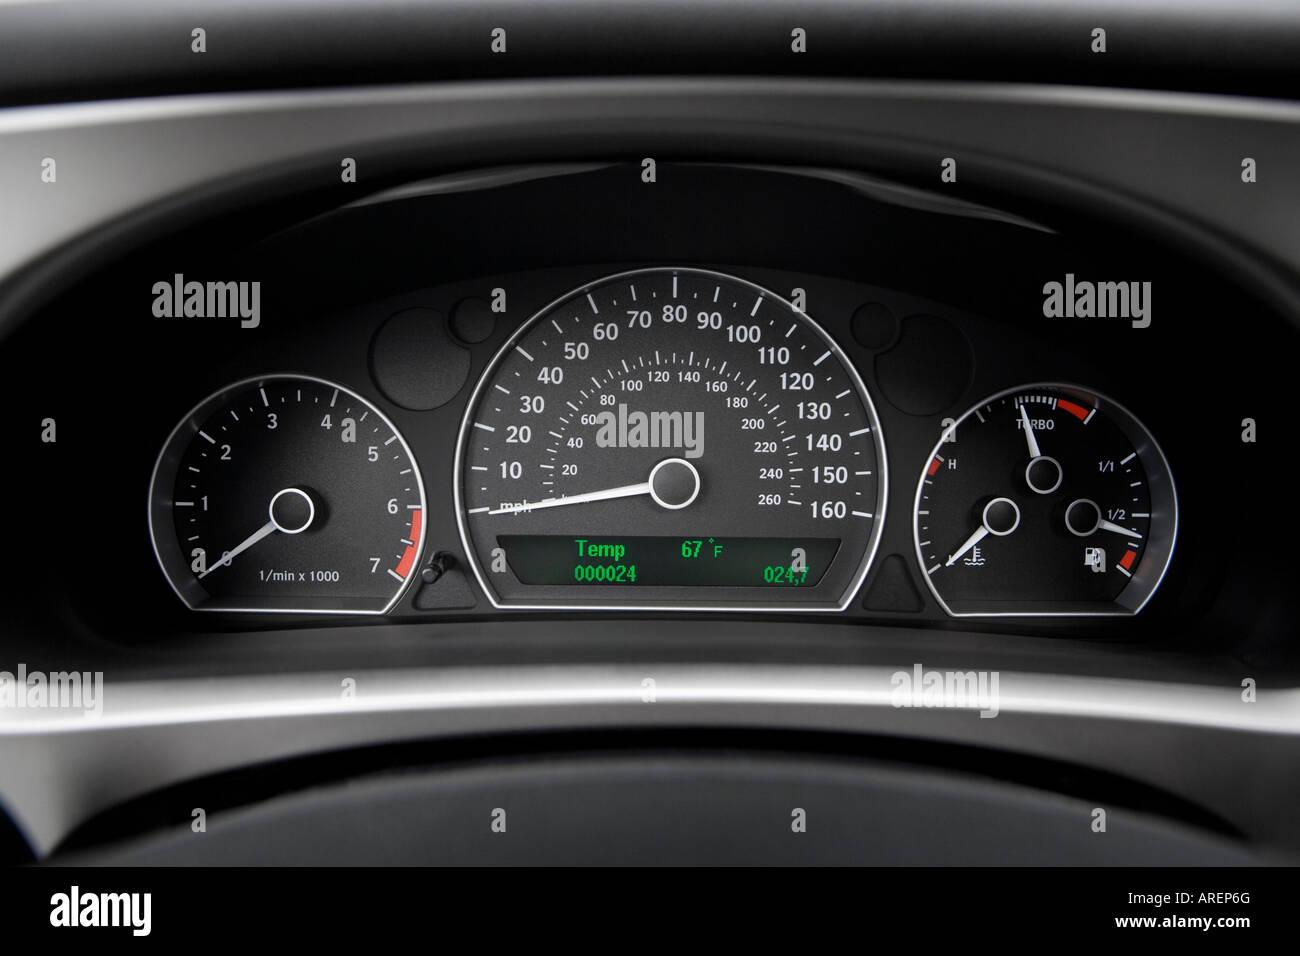 2006 Saab 9 5 23T Sport Combi In Gray